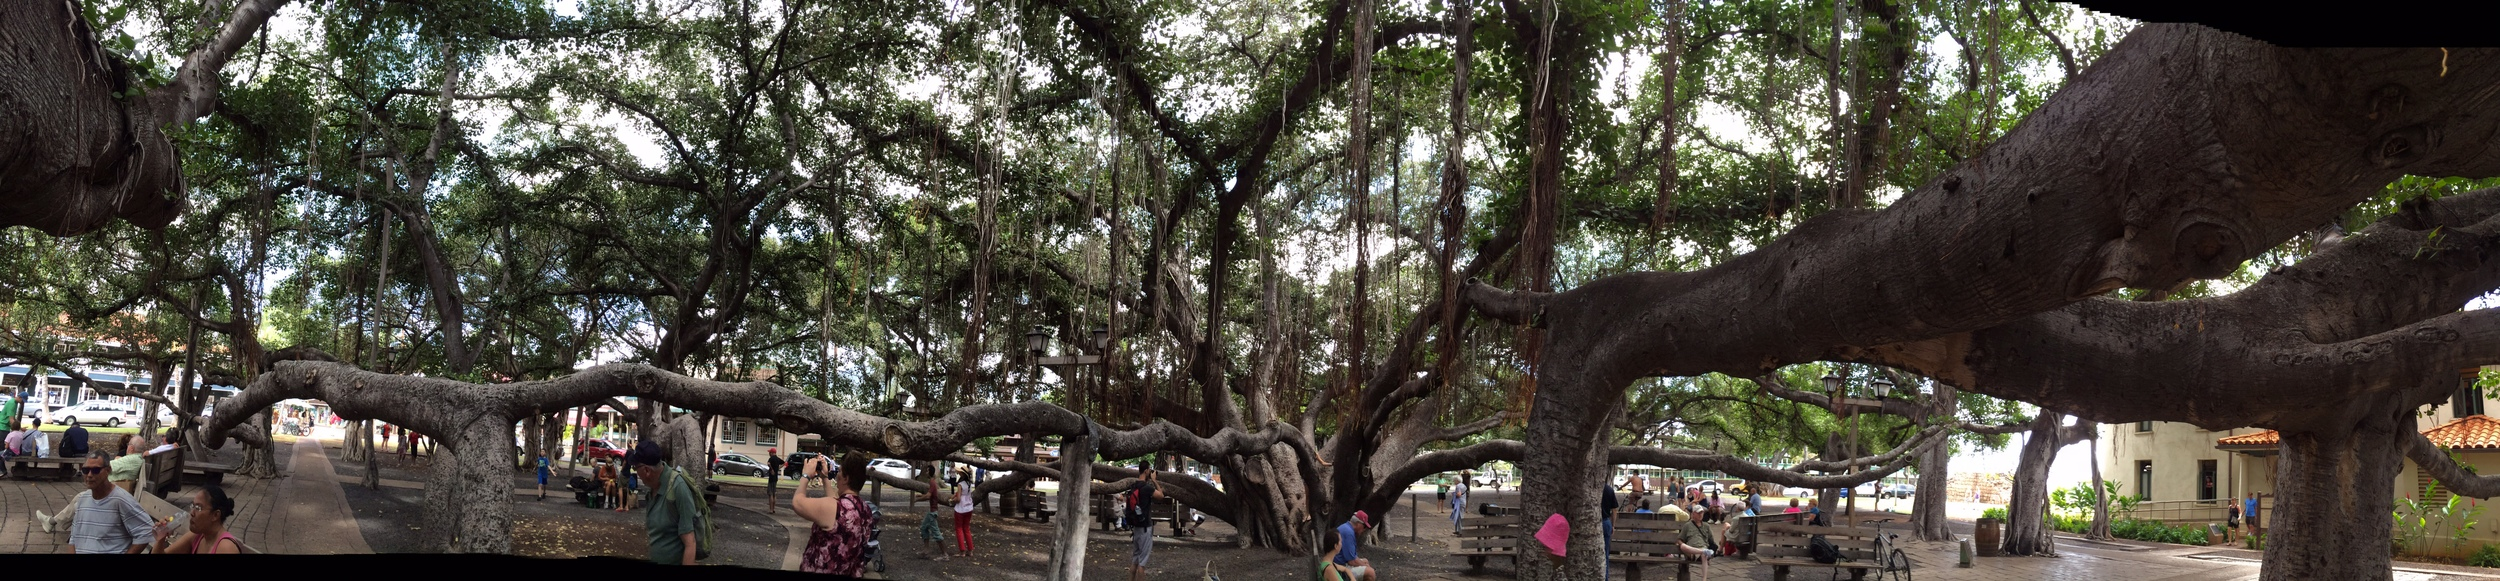 Great Banyan Tree in Lahaina, Maui